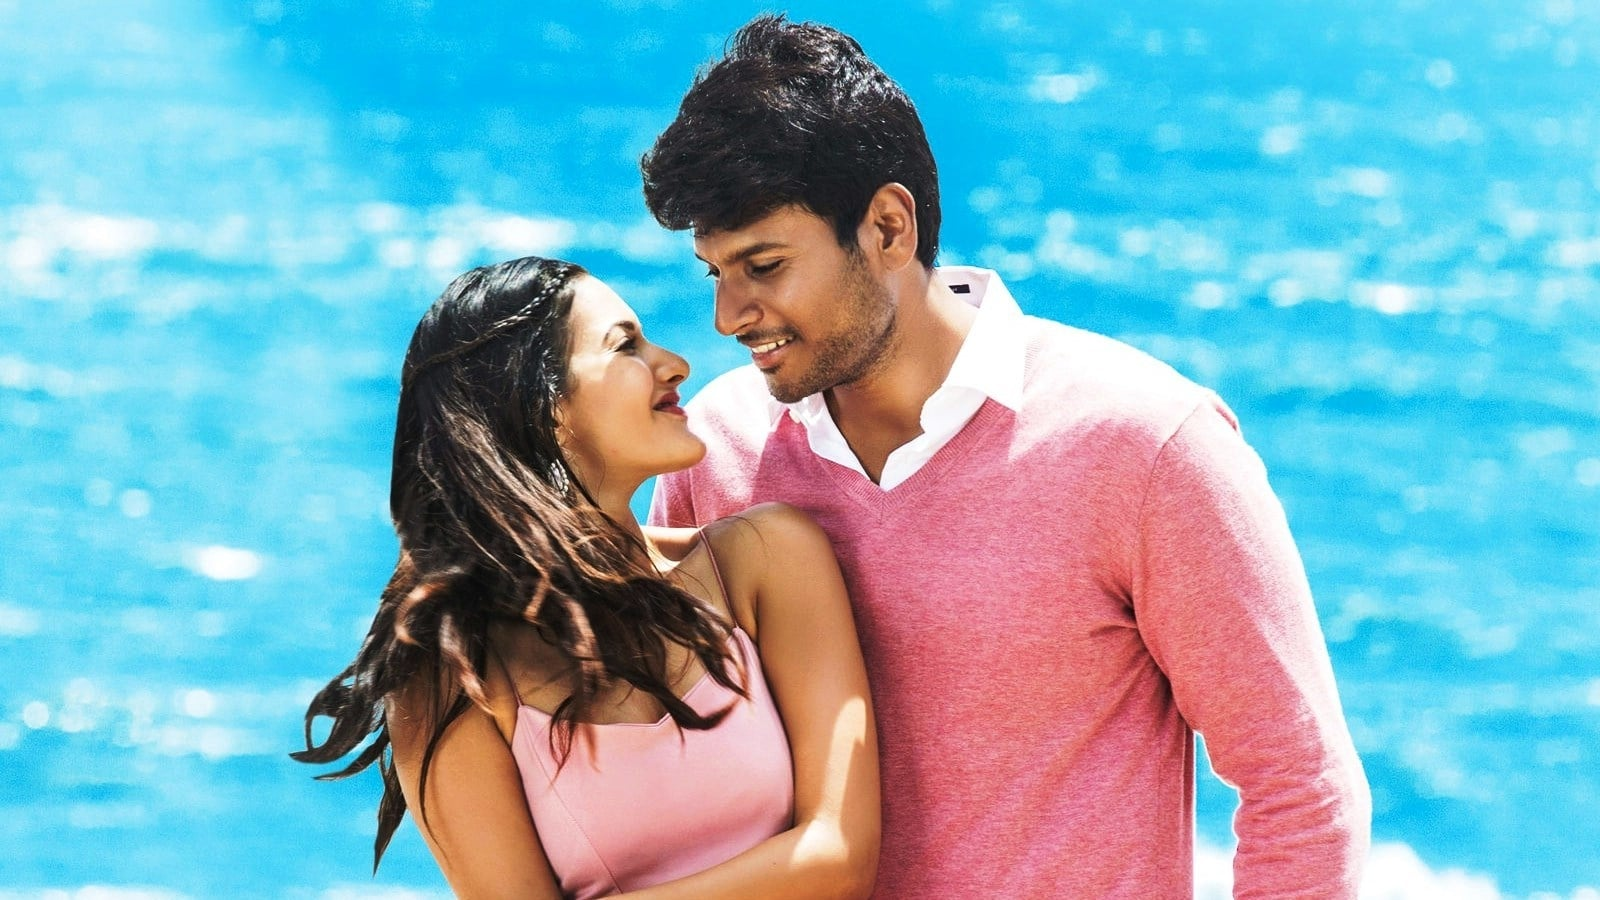 Tholi Prema 2018 V2 Hdrip Full Movie Watch Online Telugu Full